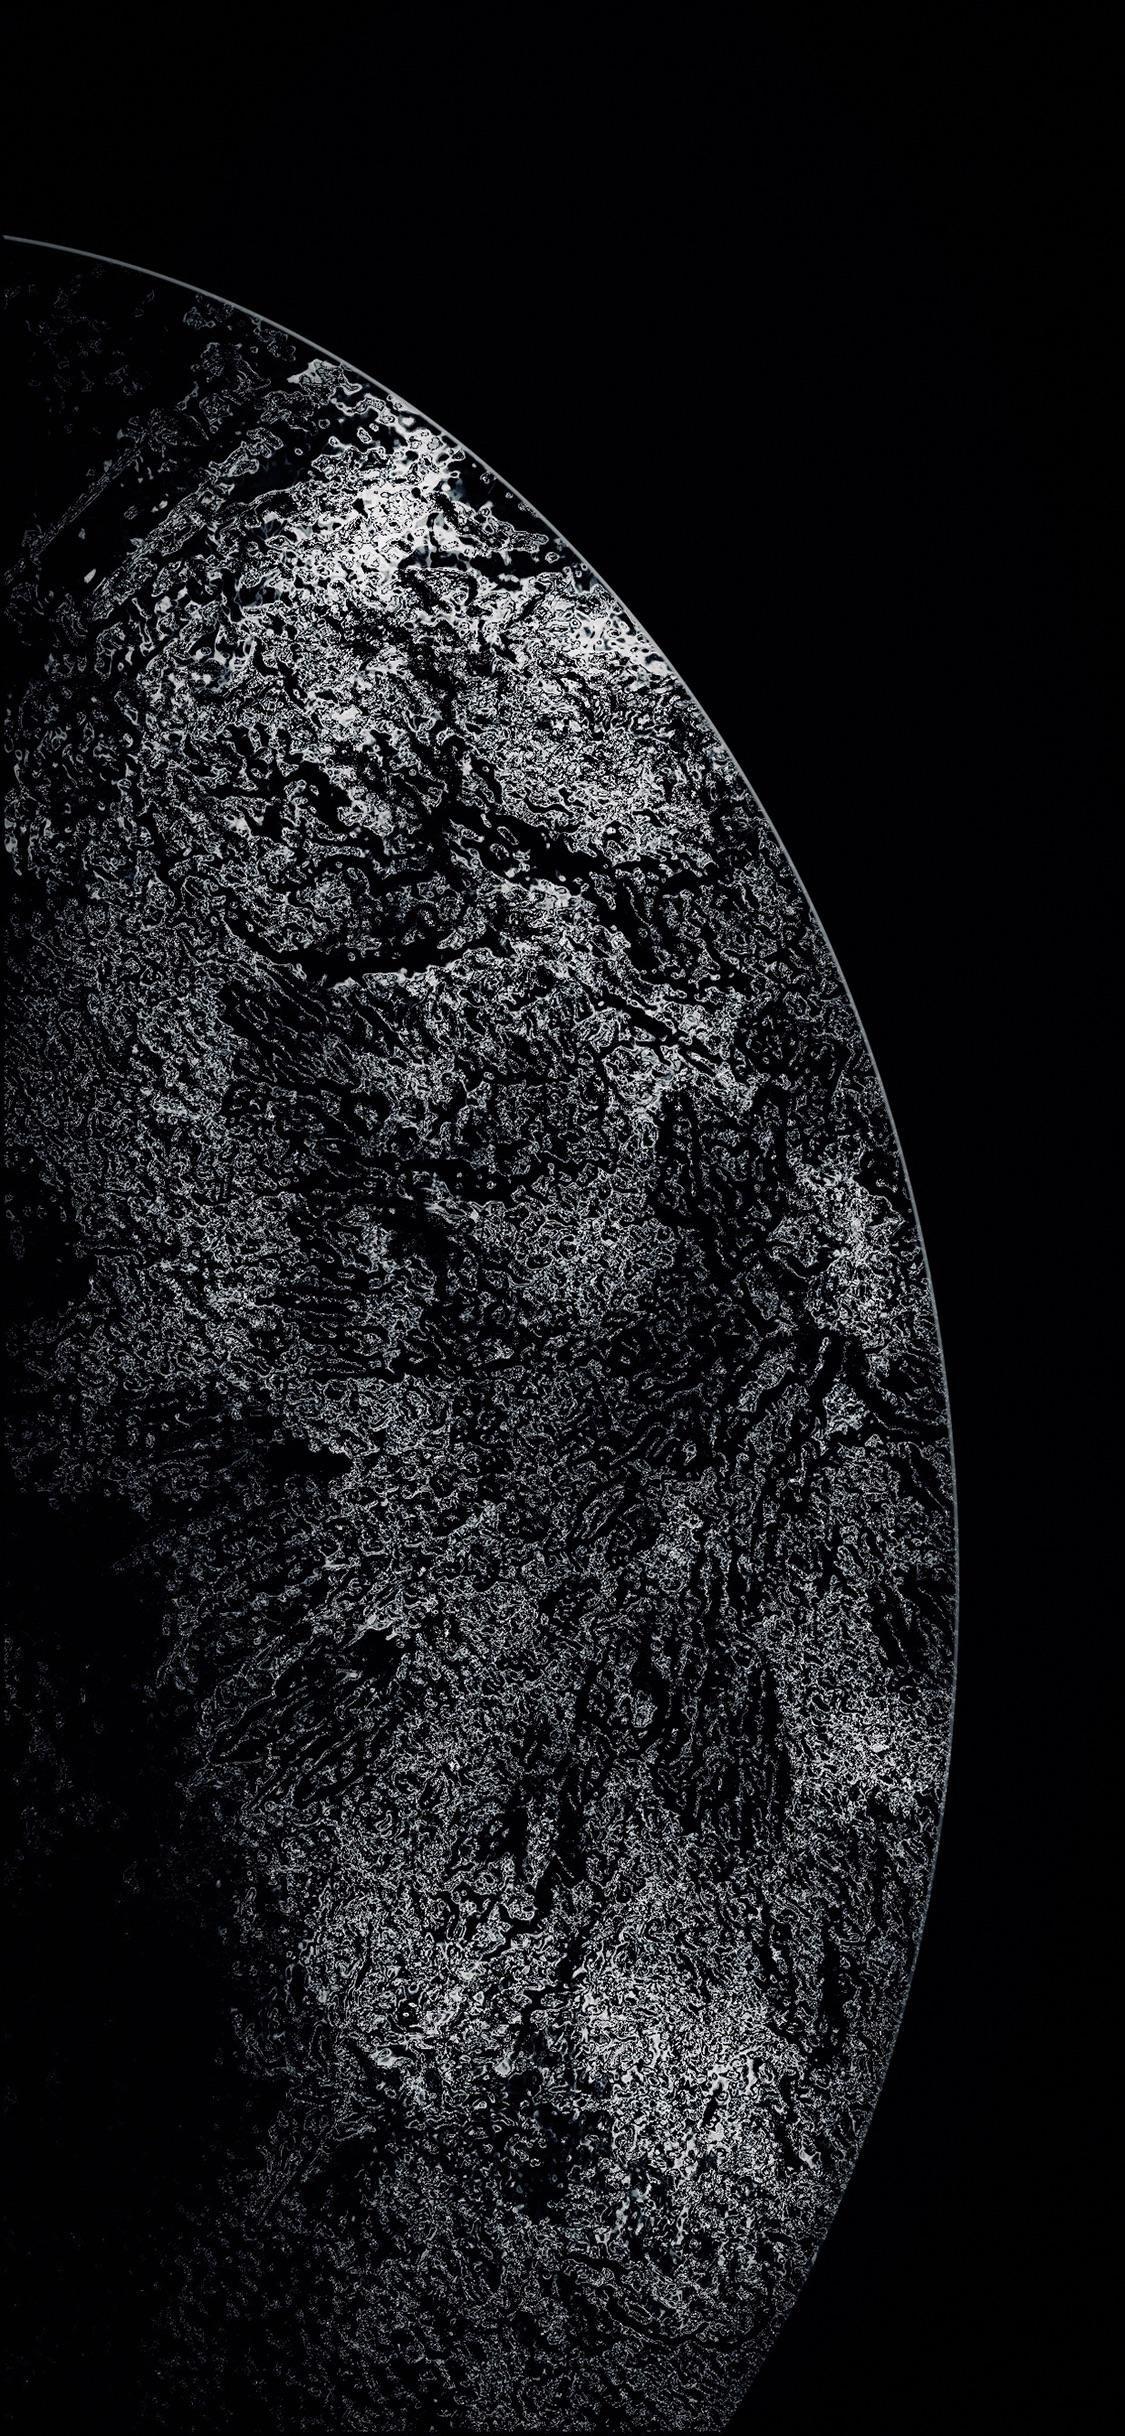 Planet Dark Black And White Wallpaper Iphone Iphone Wallpaper Hd Original Black Wallpaper Iphone